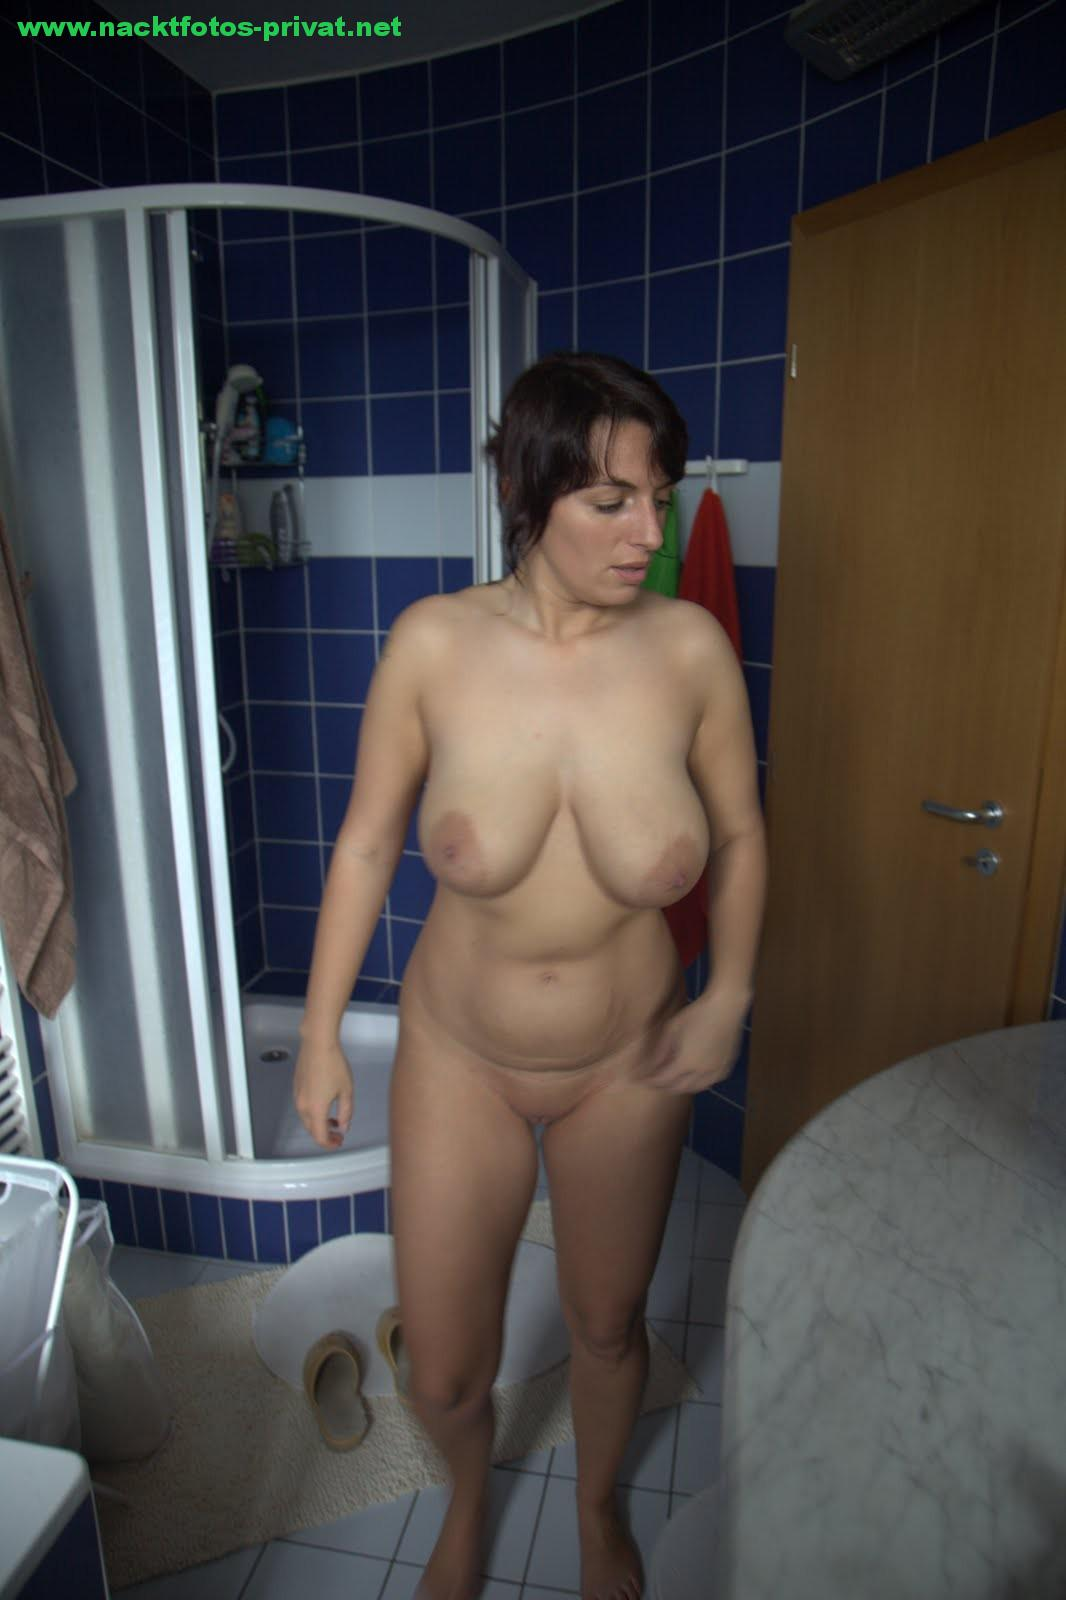 Dicke Titten Freundin Im Bad